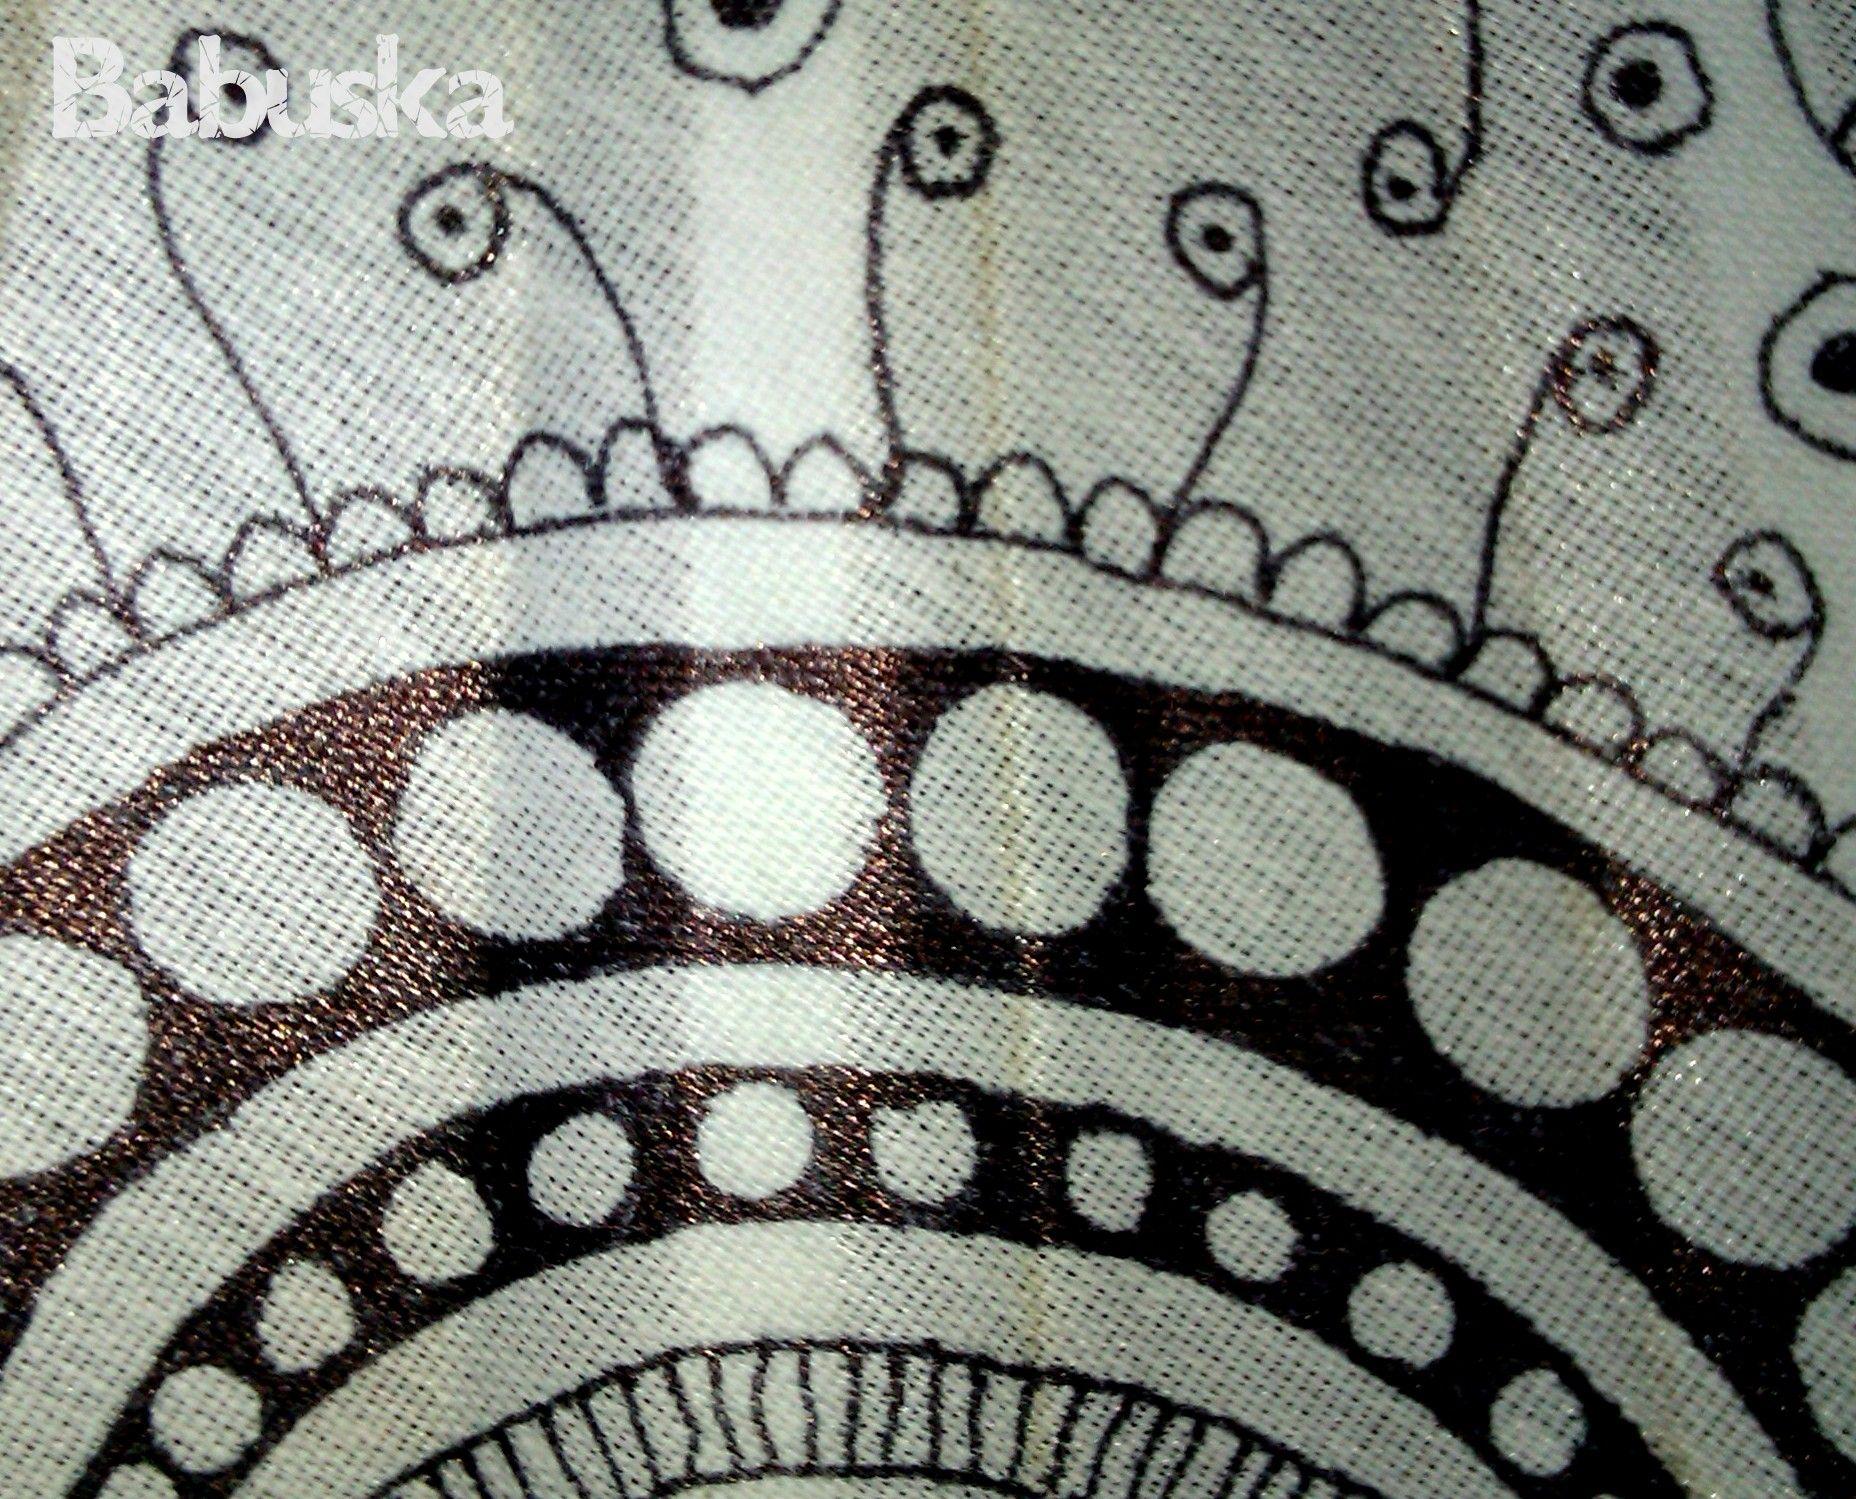 Abanico decorado con dibujos a mano alzada B396 babuska